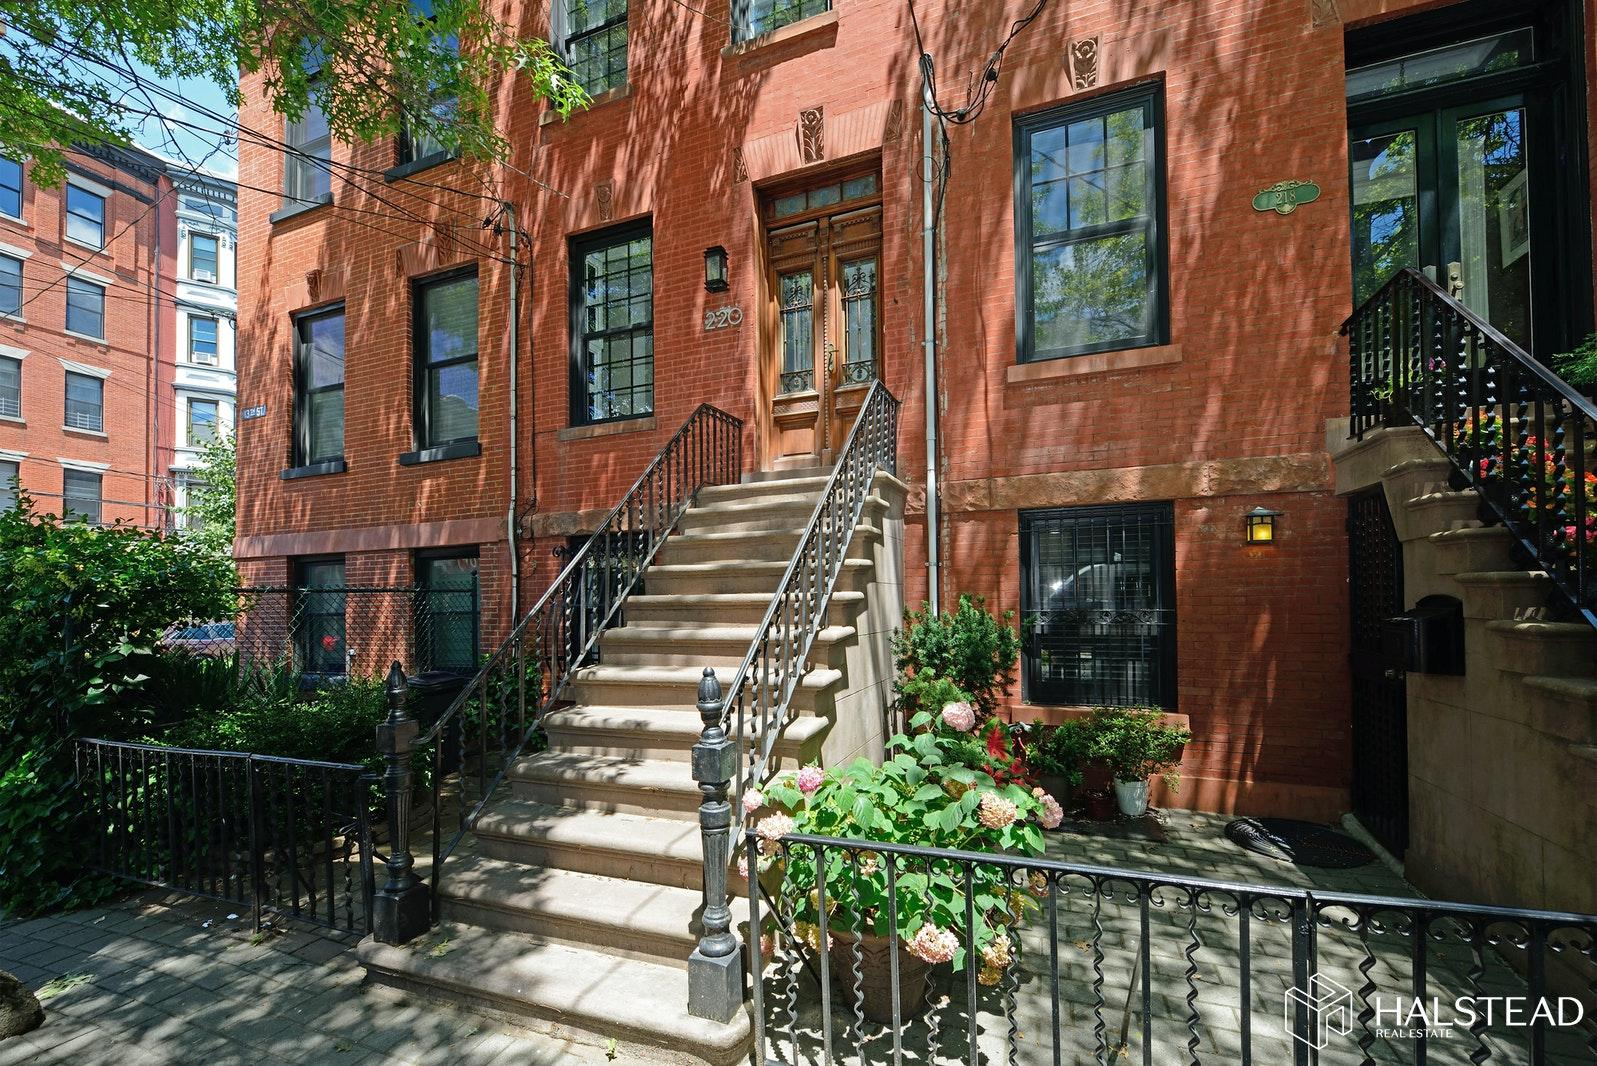 220 13th Street Hoboken Nj 07030 Id 20220731 For Sale Halstead Real Estate